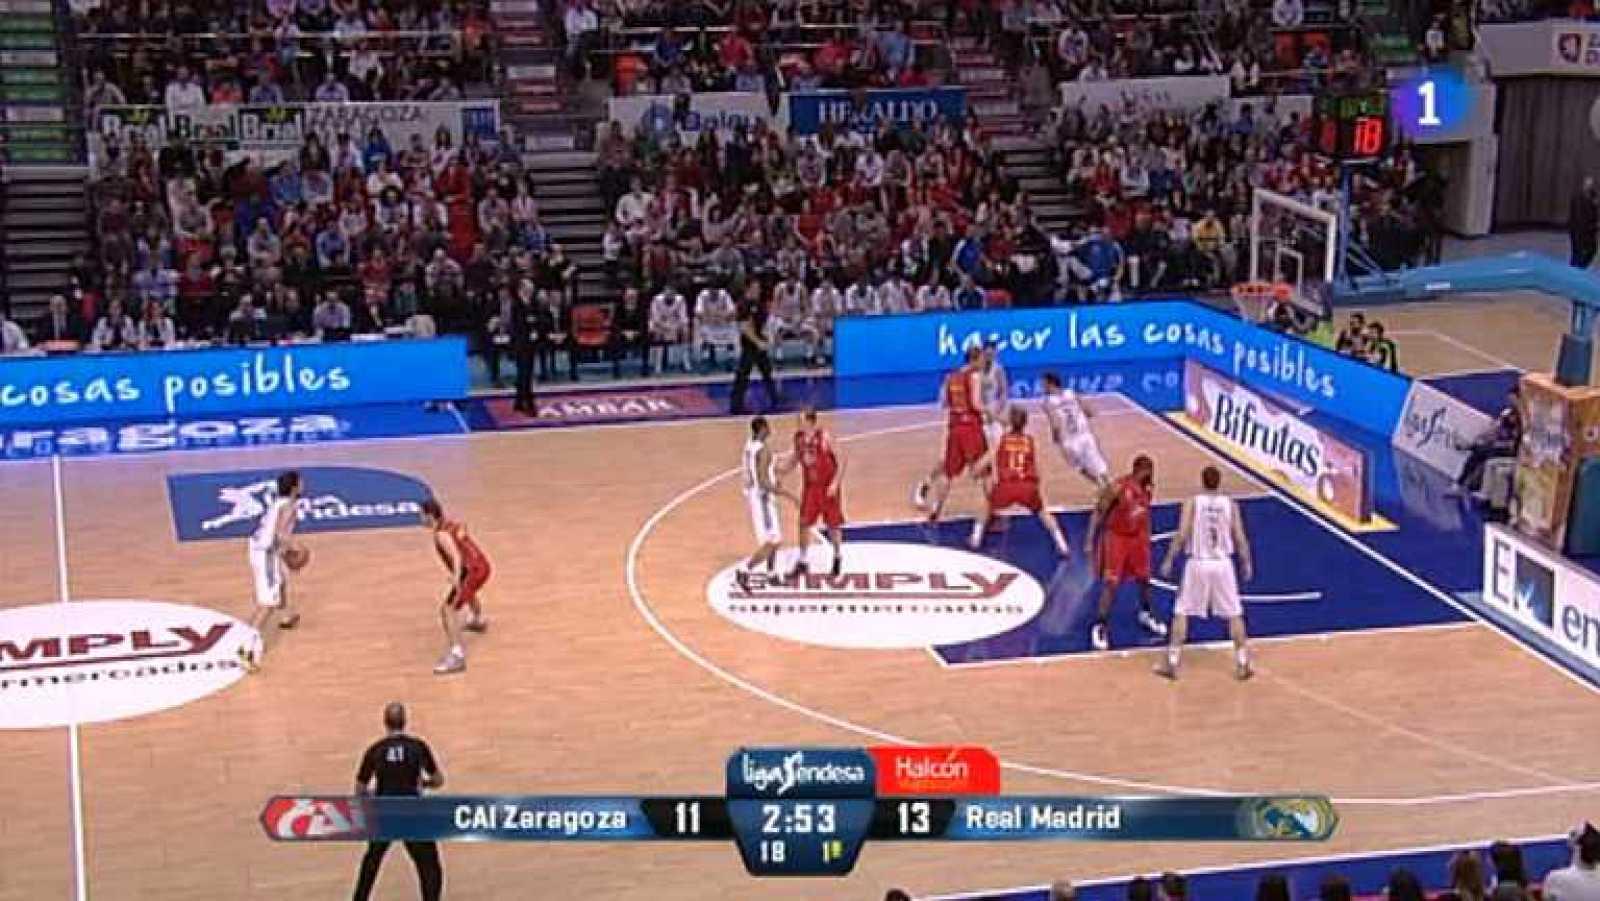 Baloncesto - Liga Endesa - CAI Zaragoza - Real Madrid - ver ahora